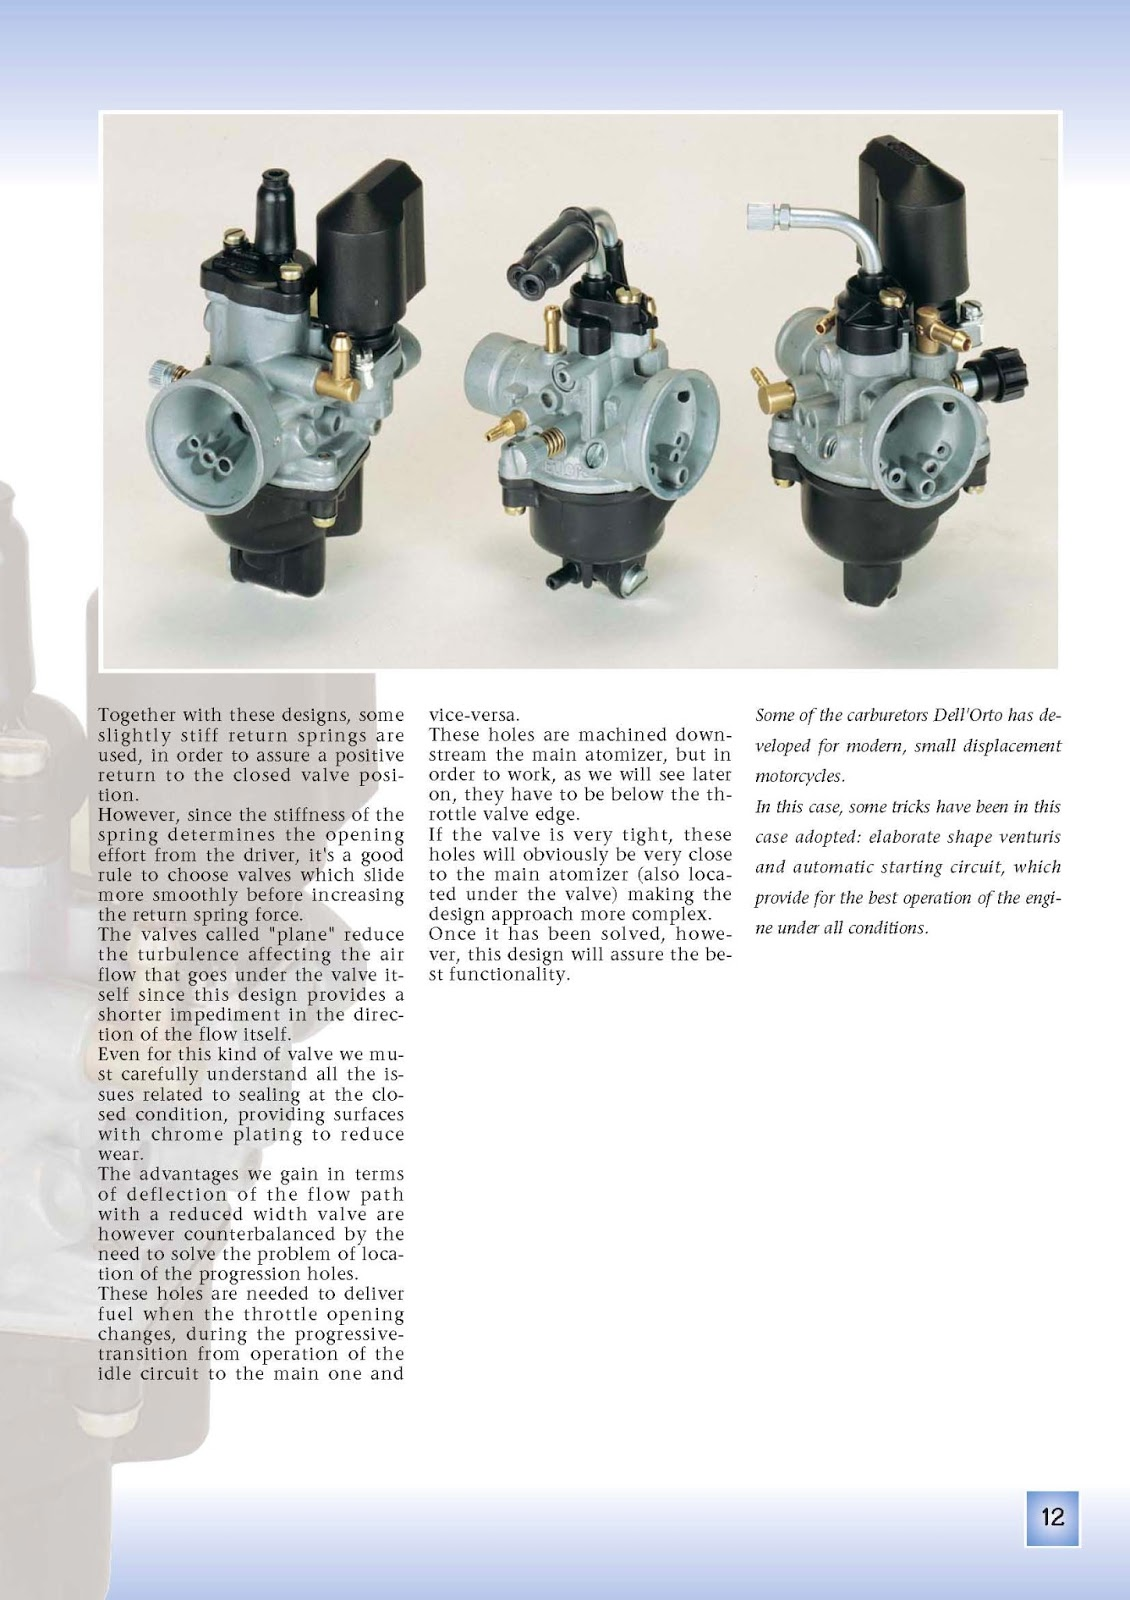 Dellorto Carburetor tuning Manual